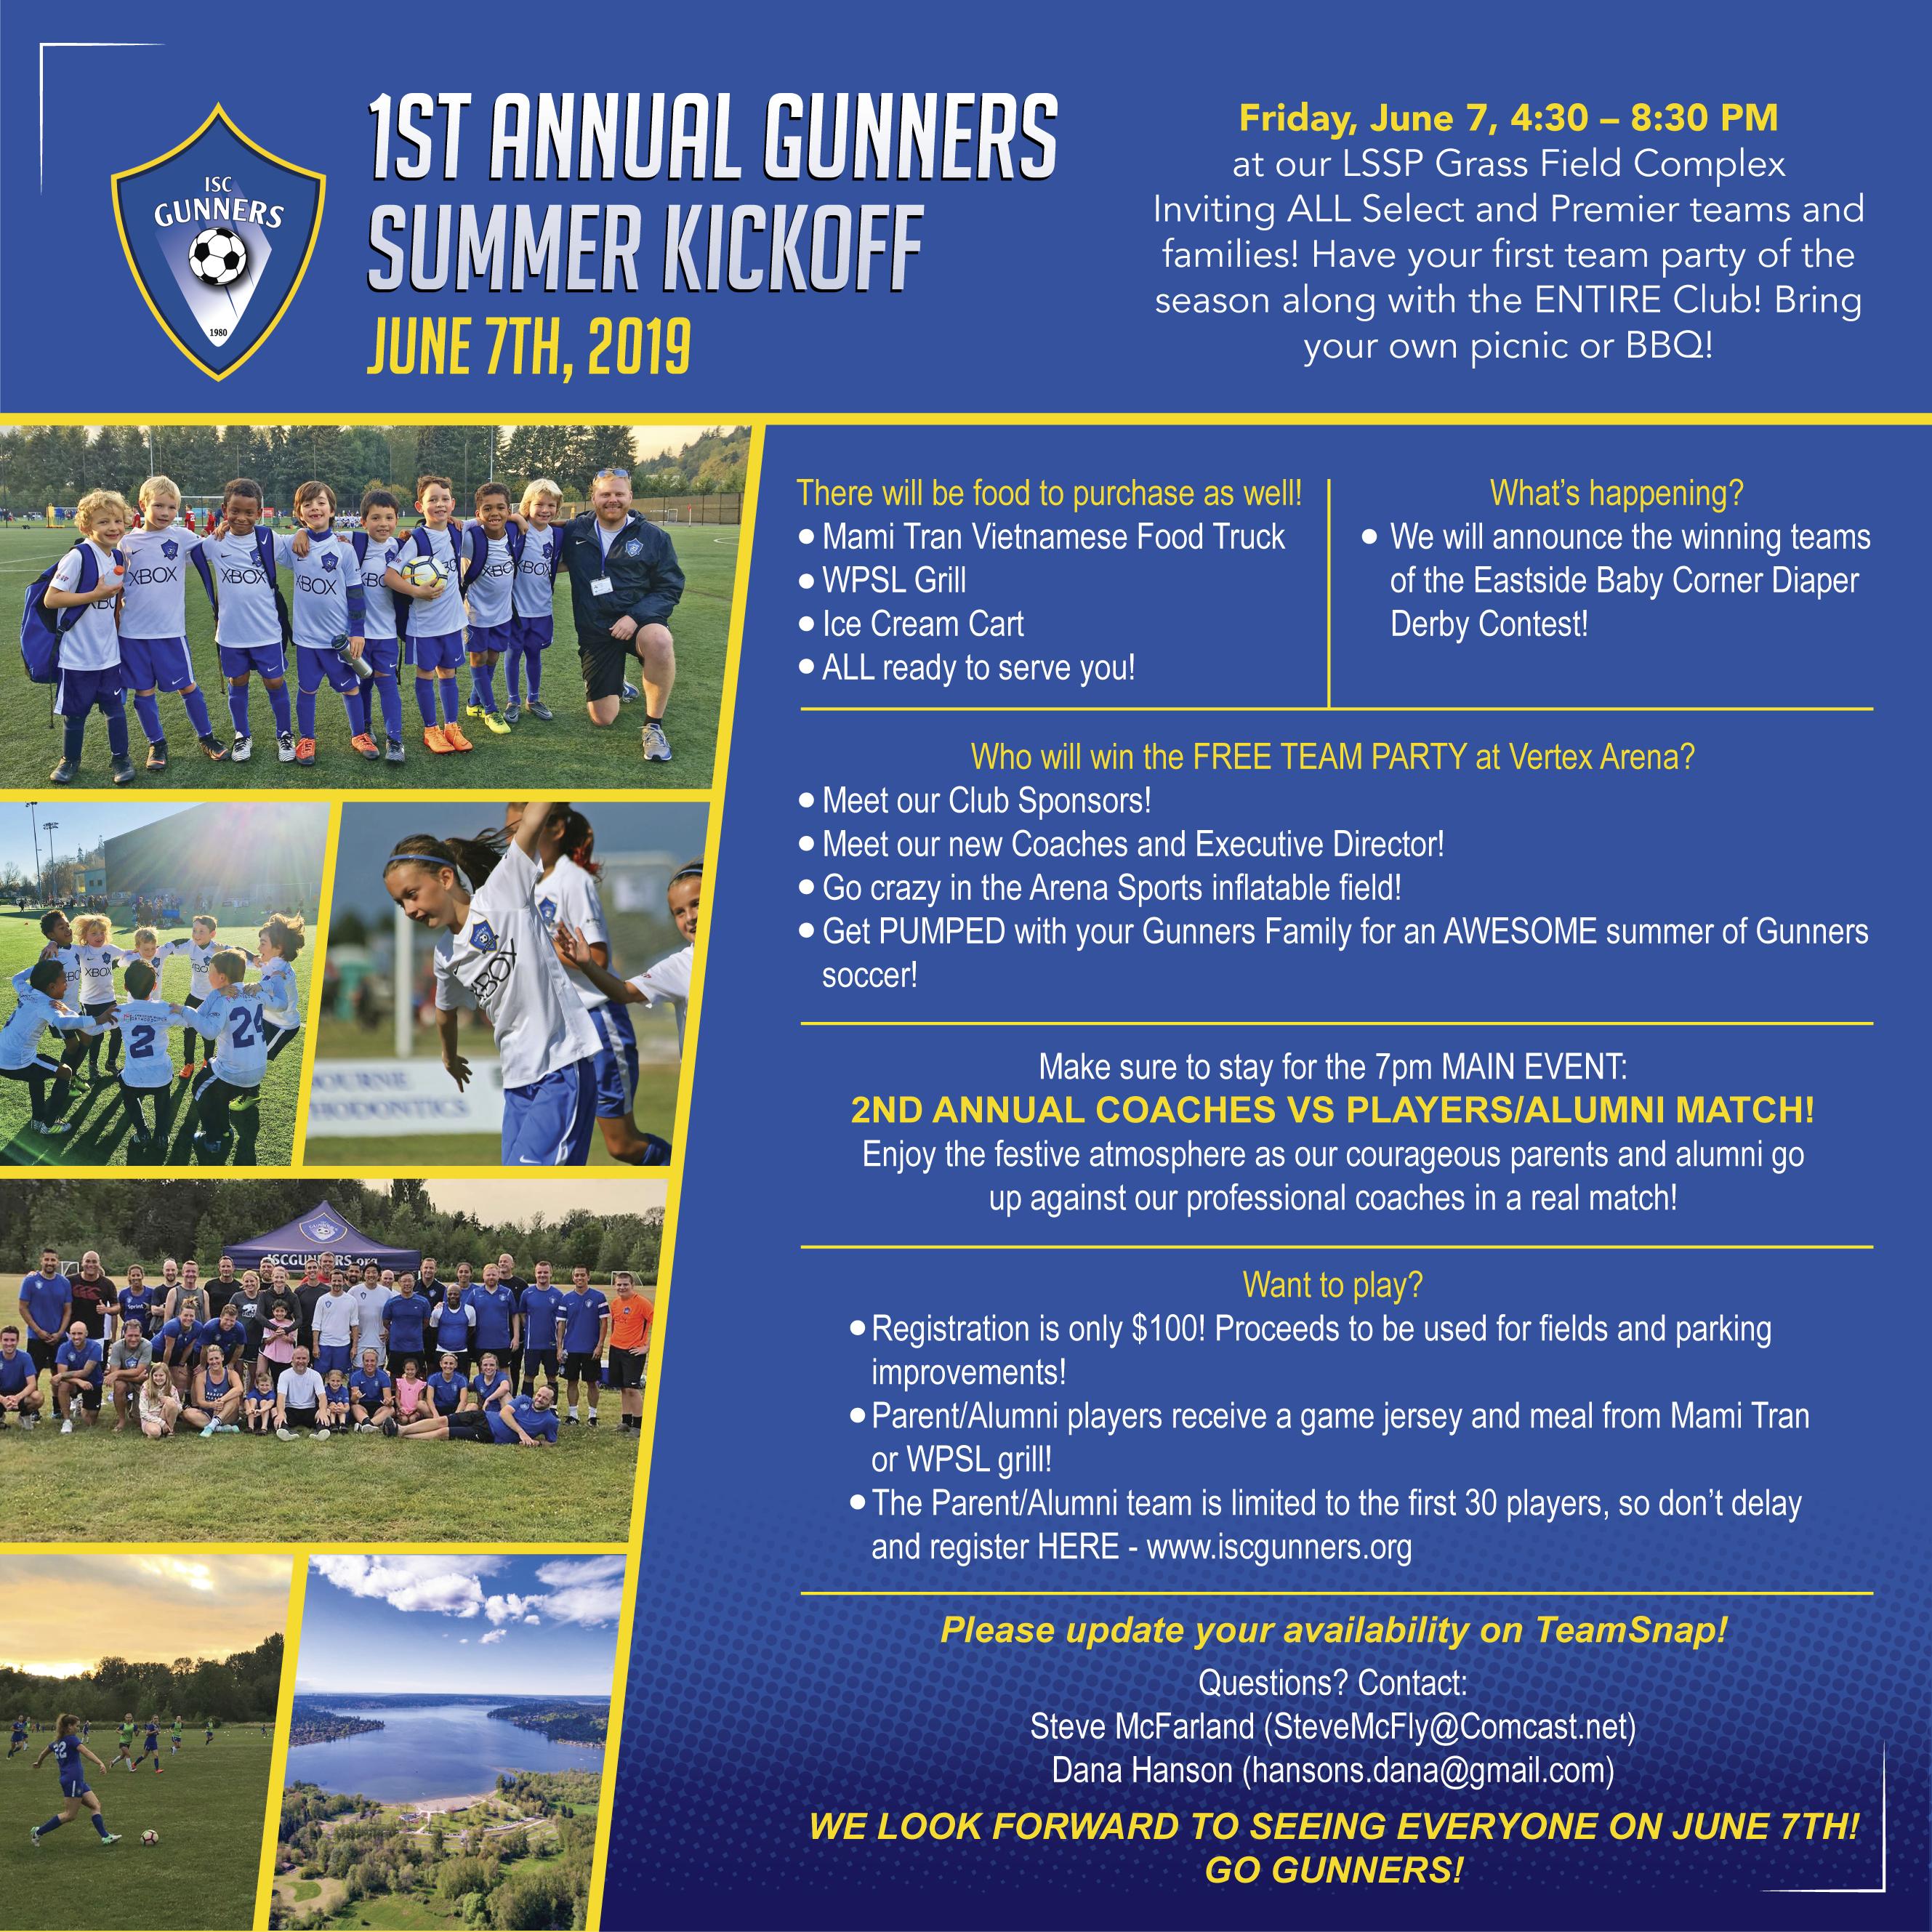 1st Annual Gunners Summer Kickoff - June 7th, 2019